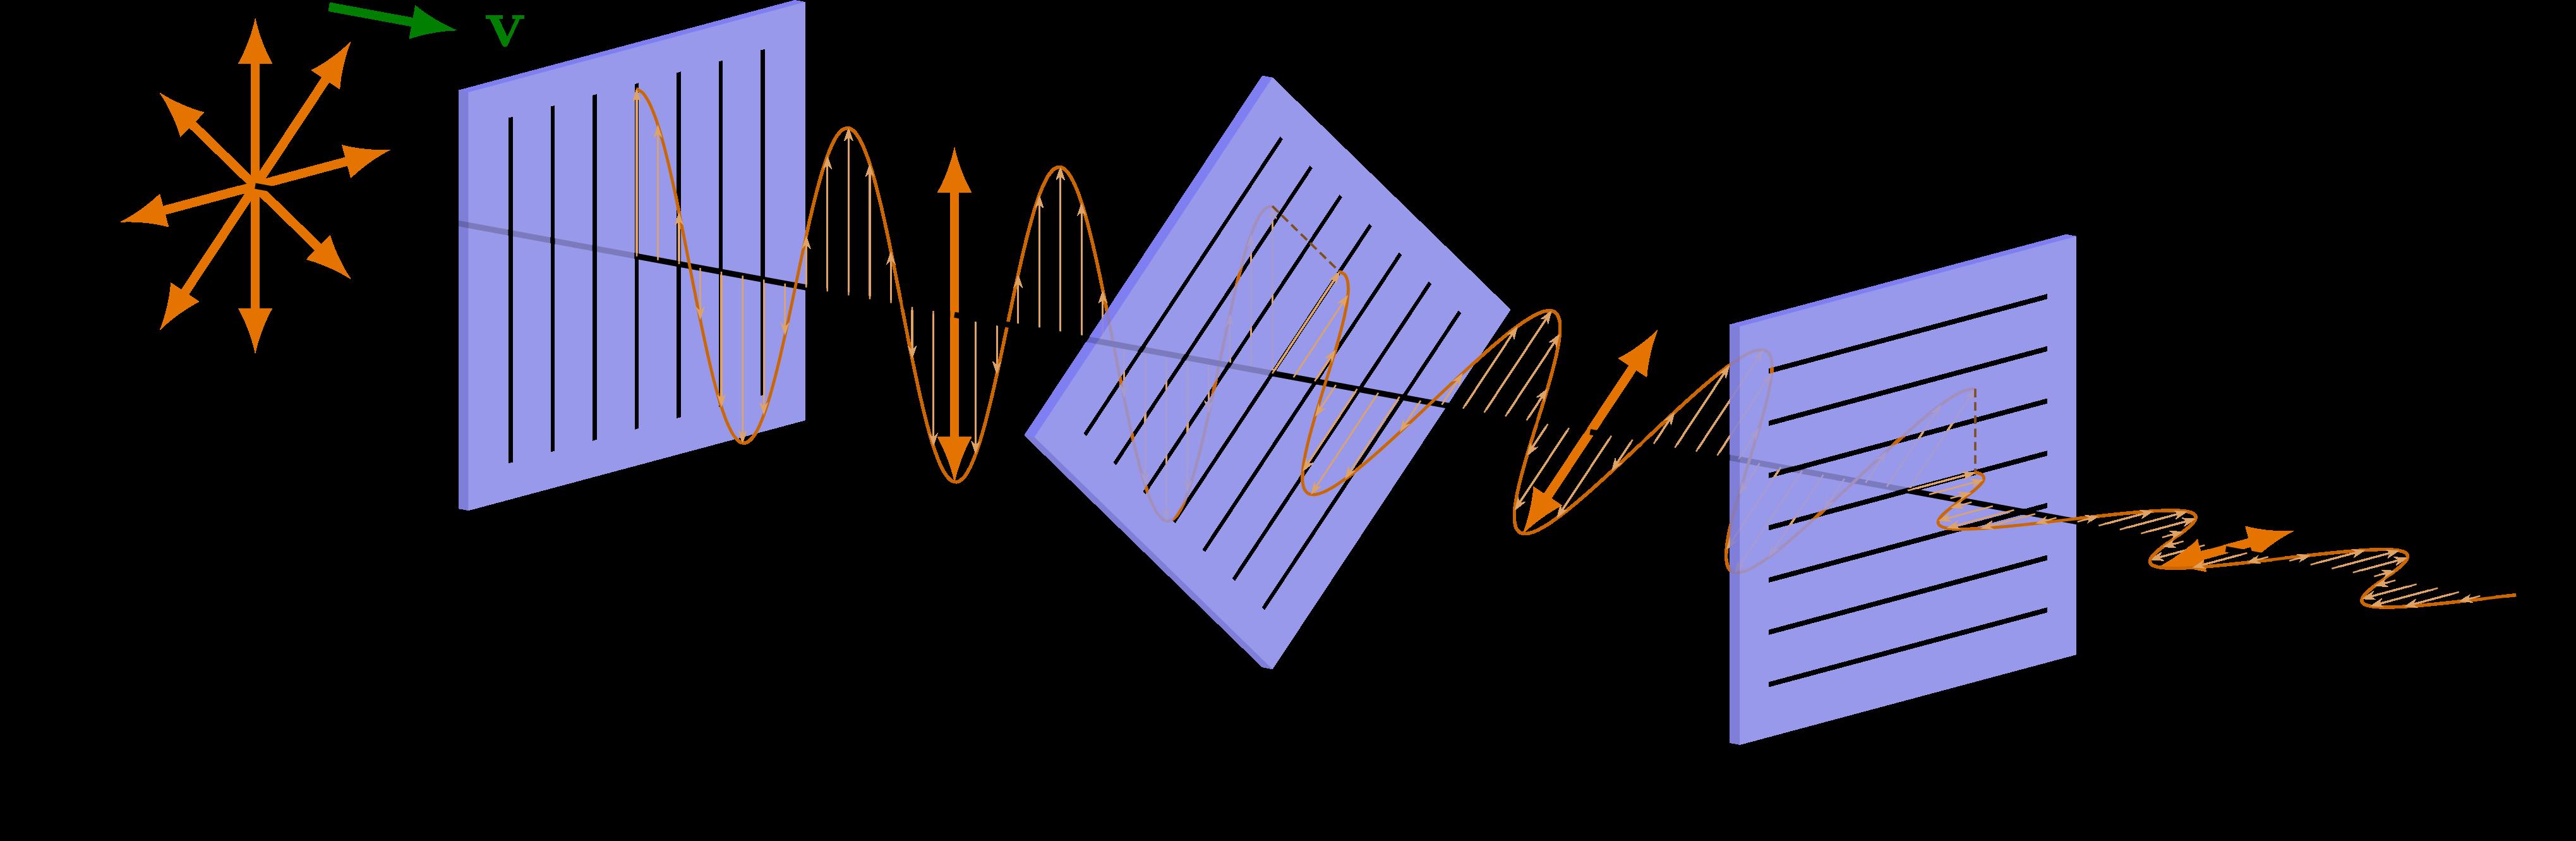 optics_polarization-003.png